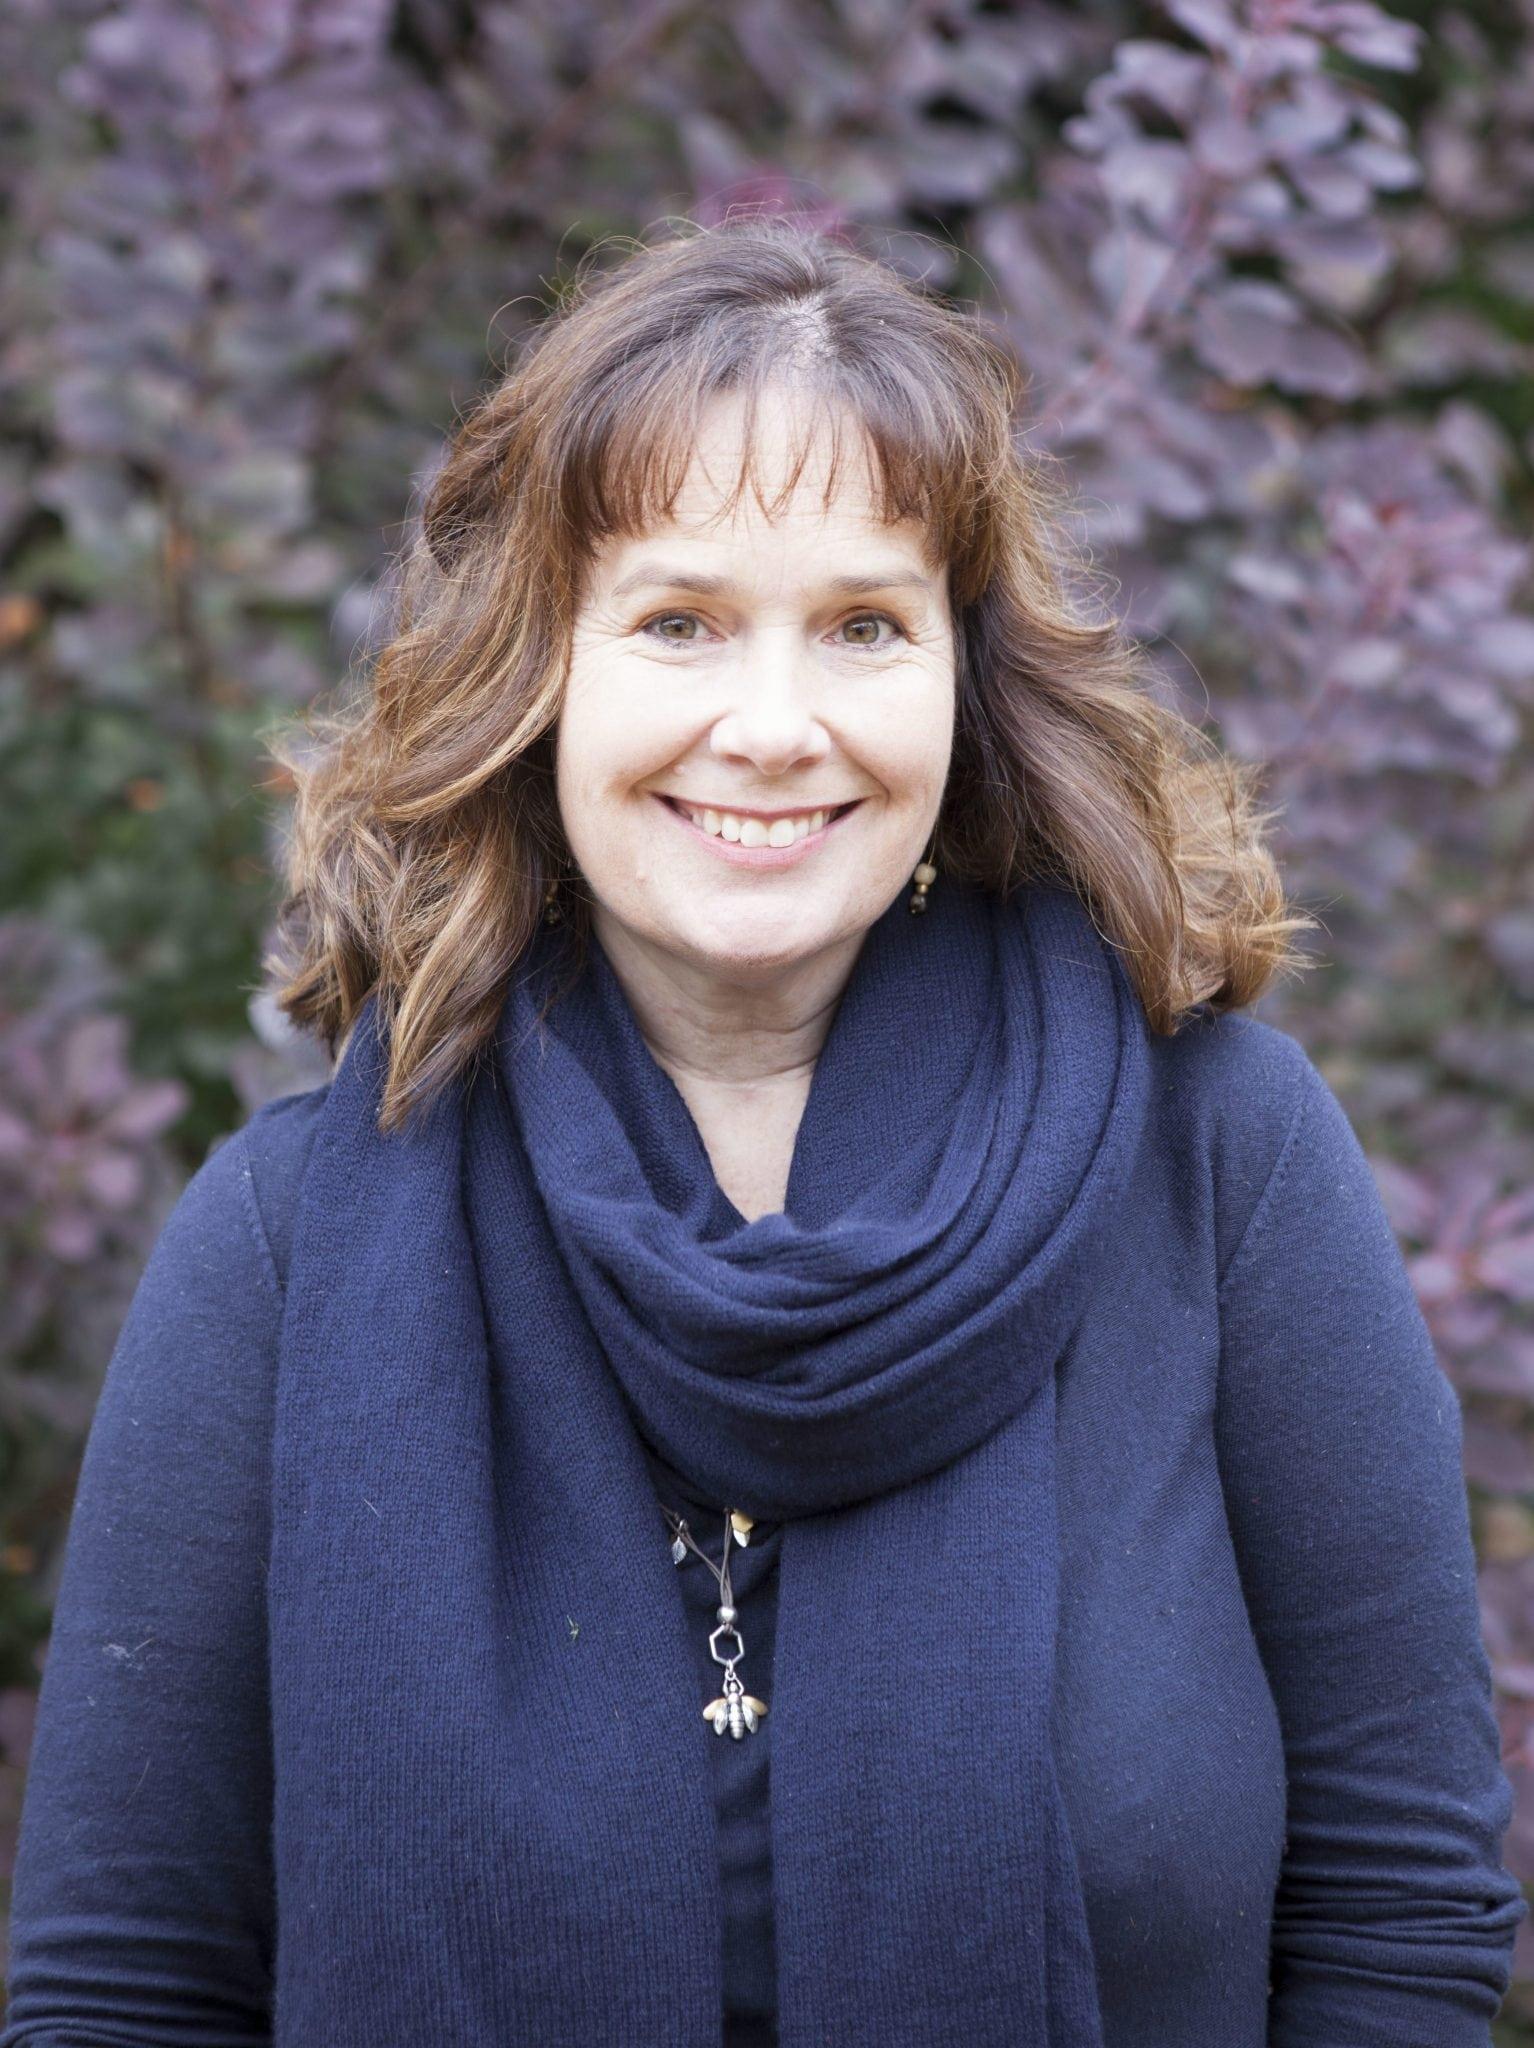 Julie Deane OBE